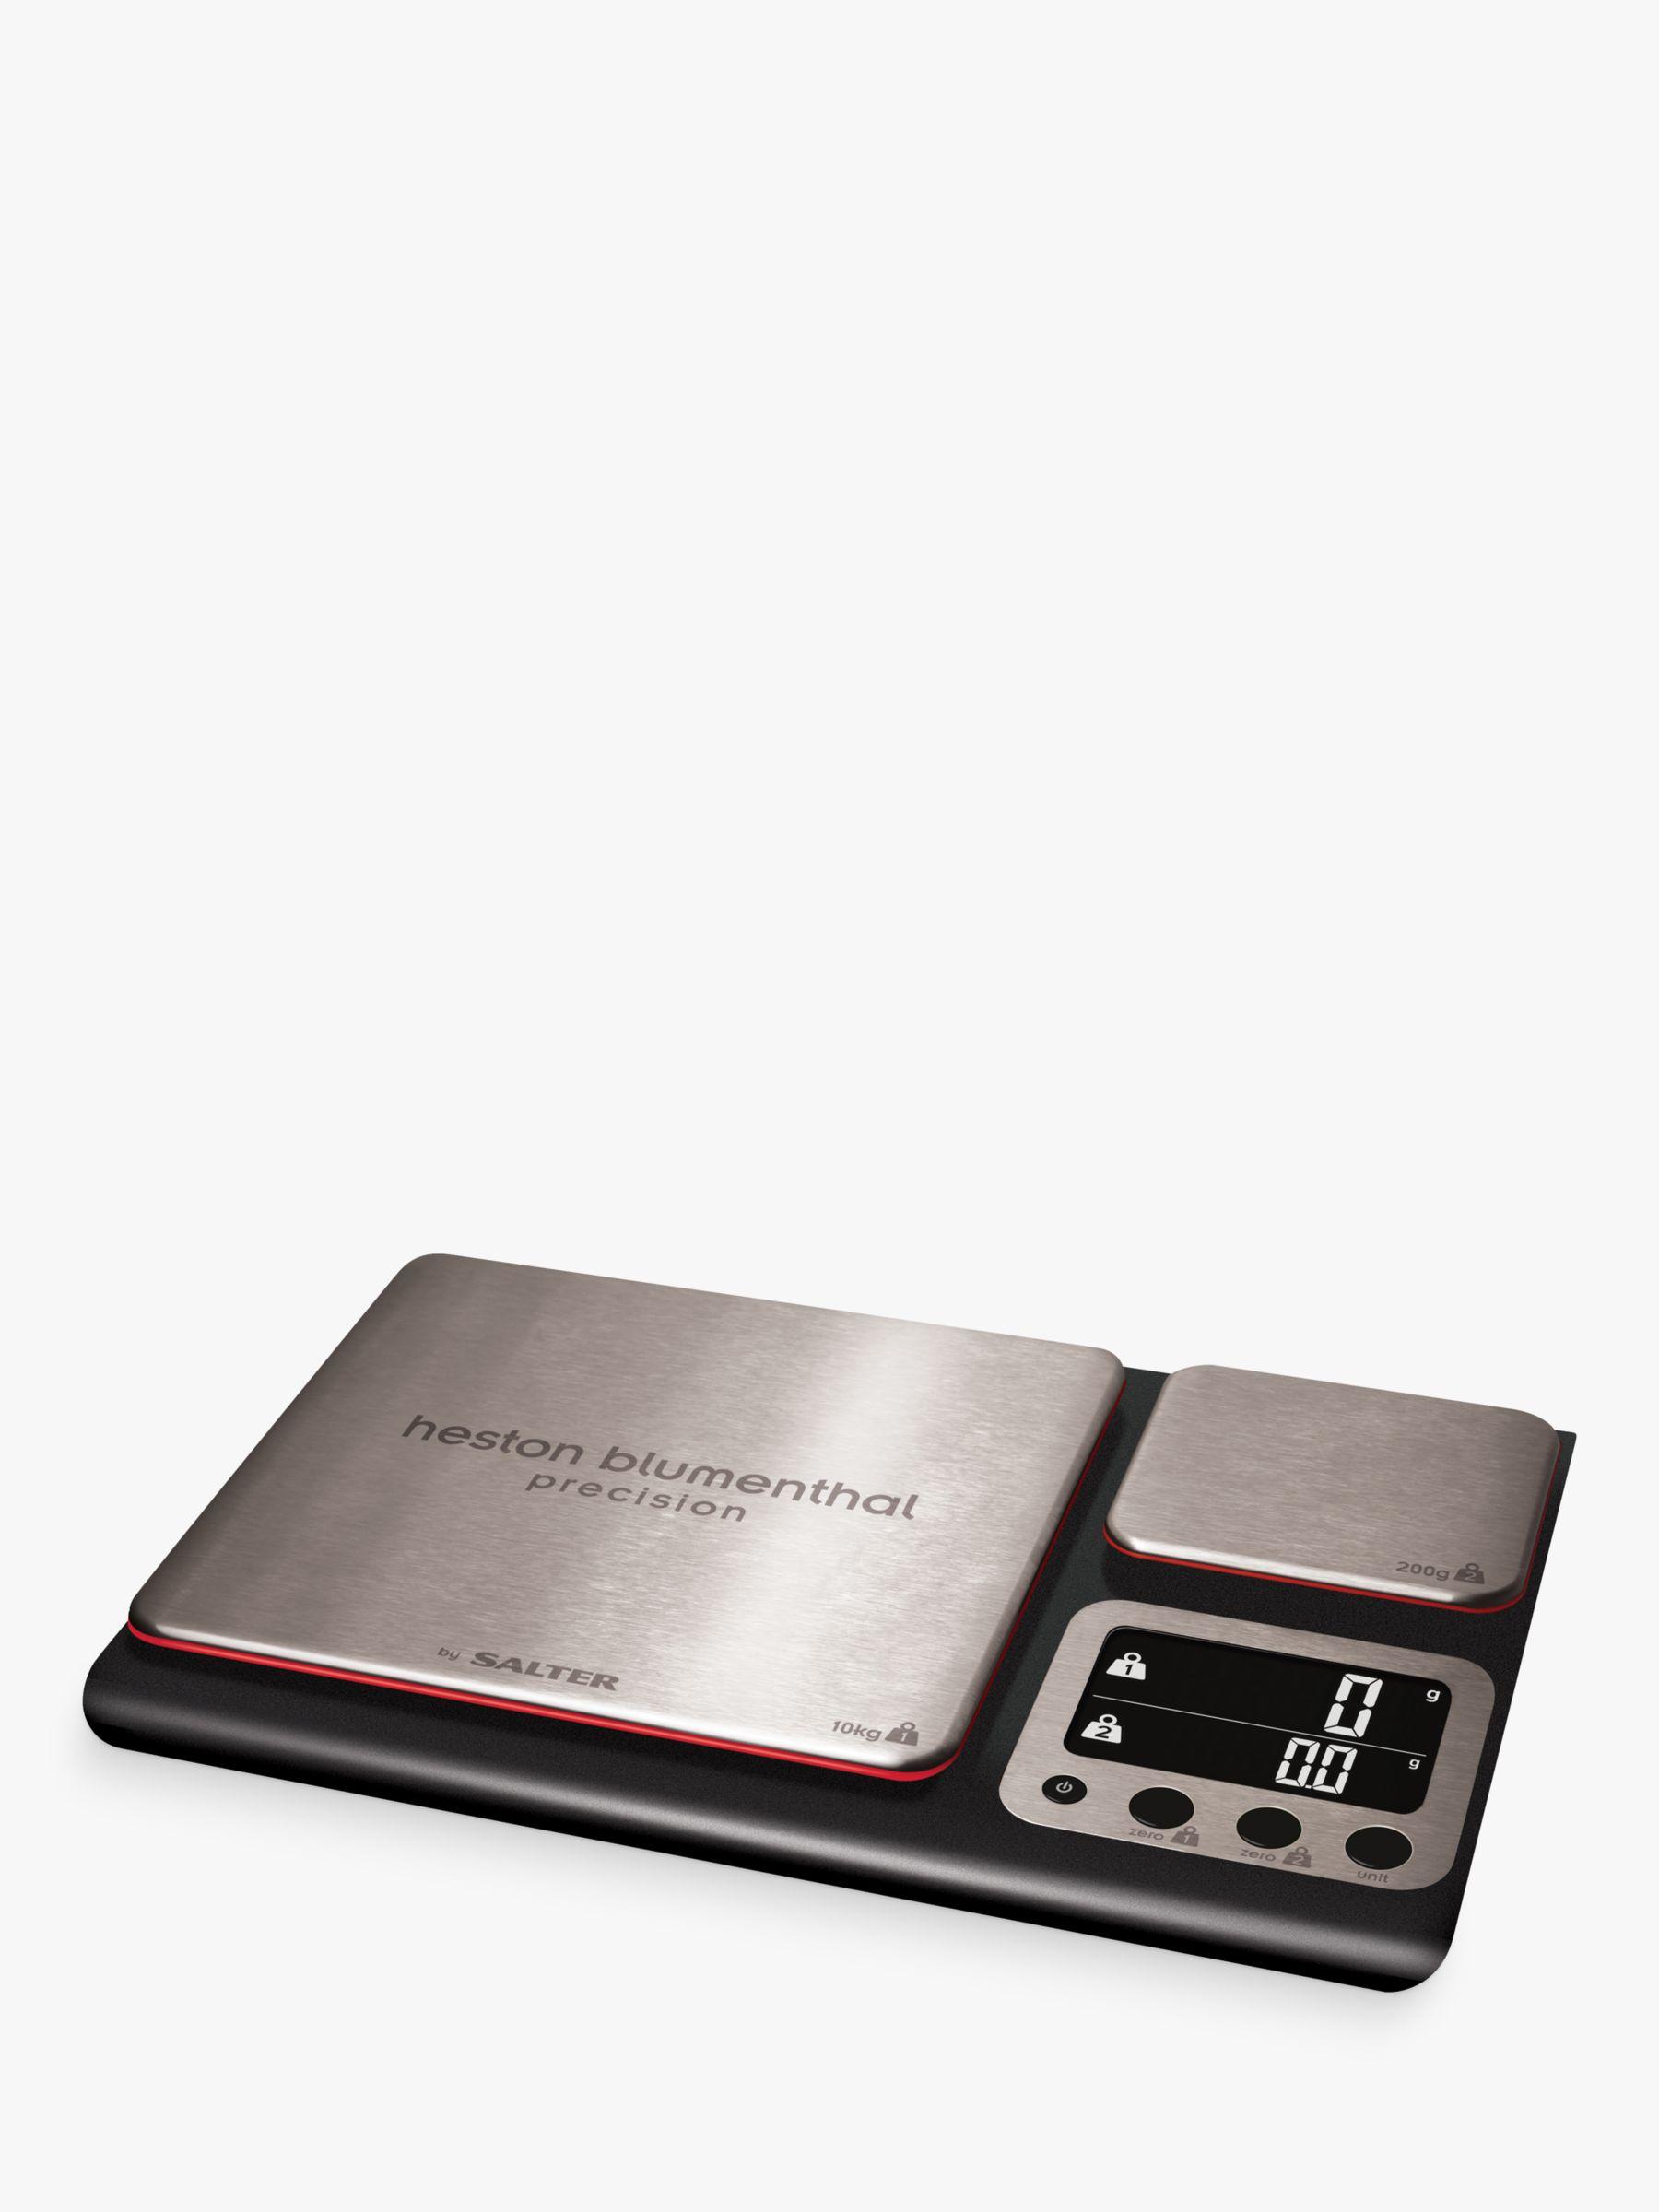 Heston Heston Blumenthal by Salter Dual Precision Digital Scale, 10kg